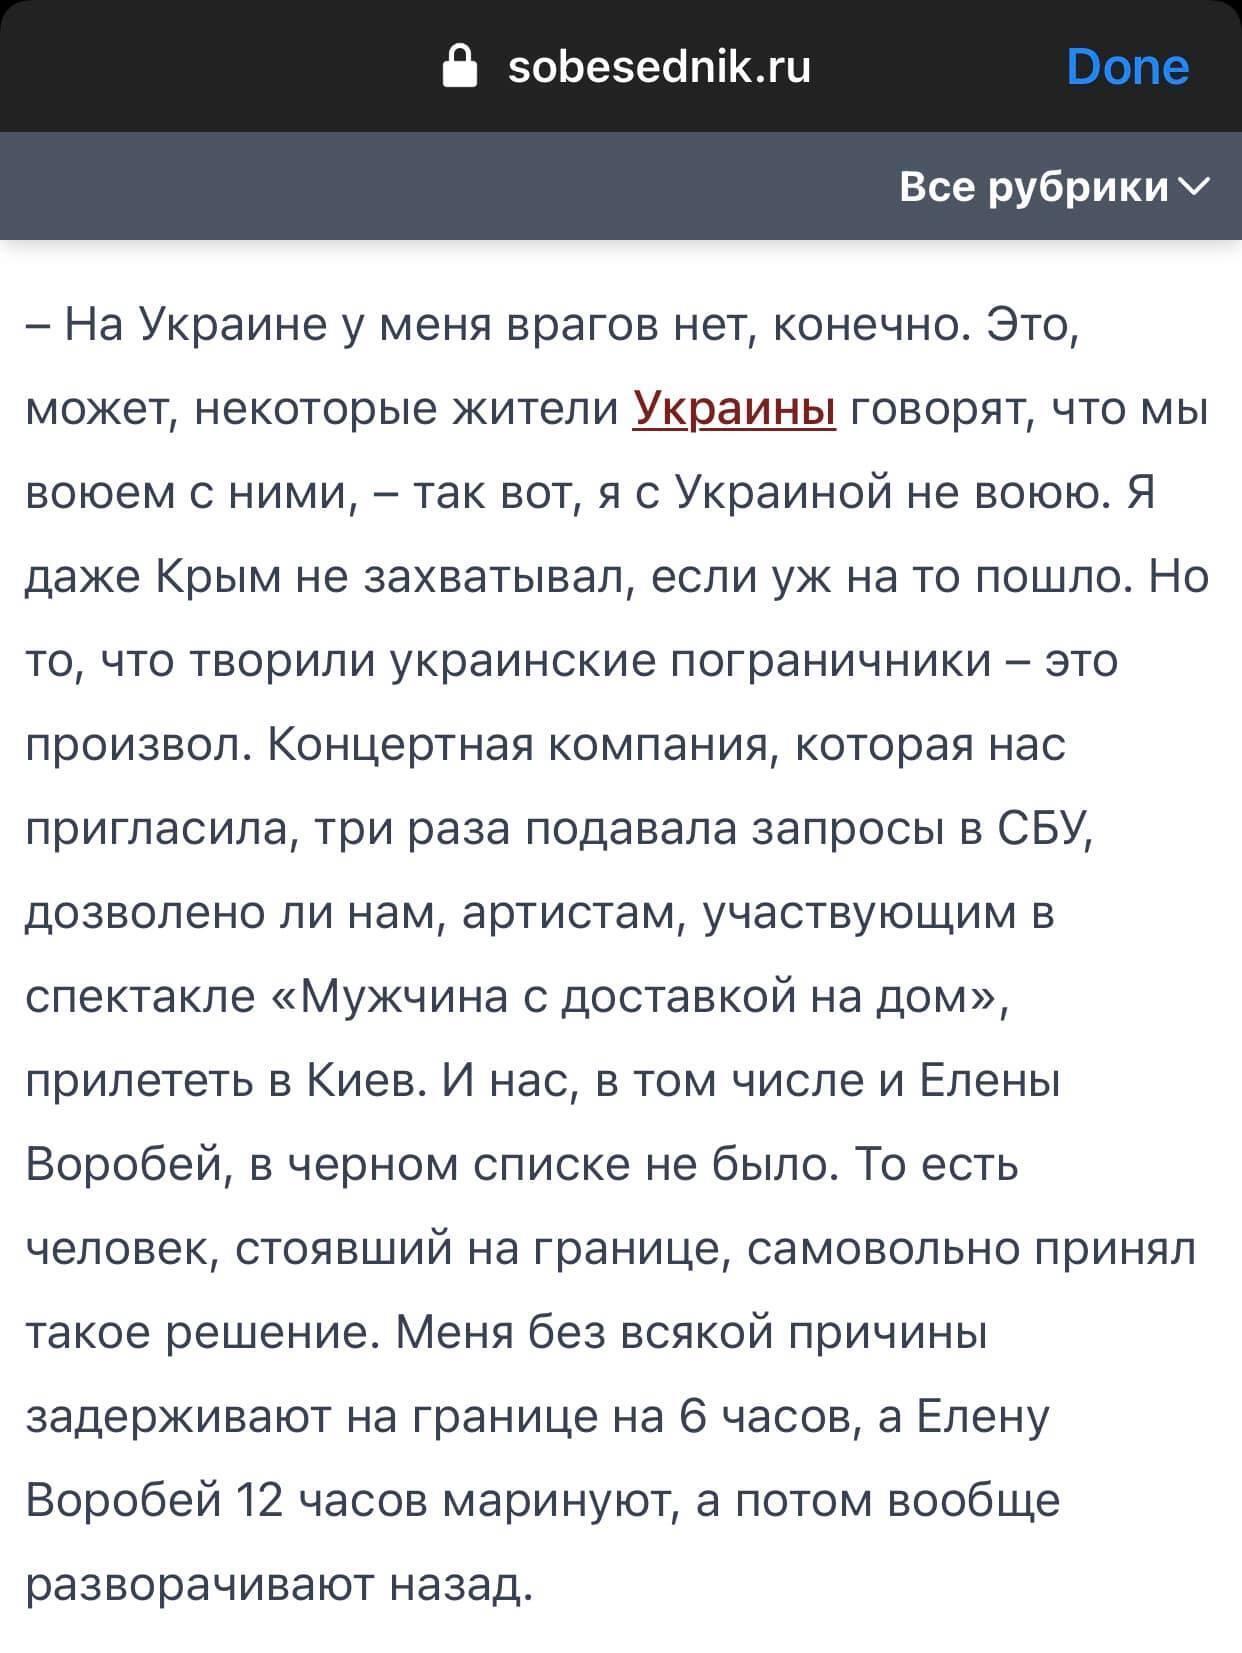 Скриншот публикации.